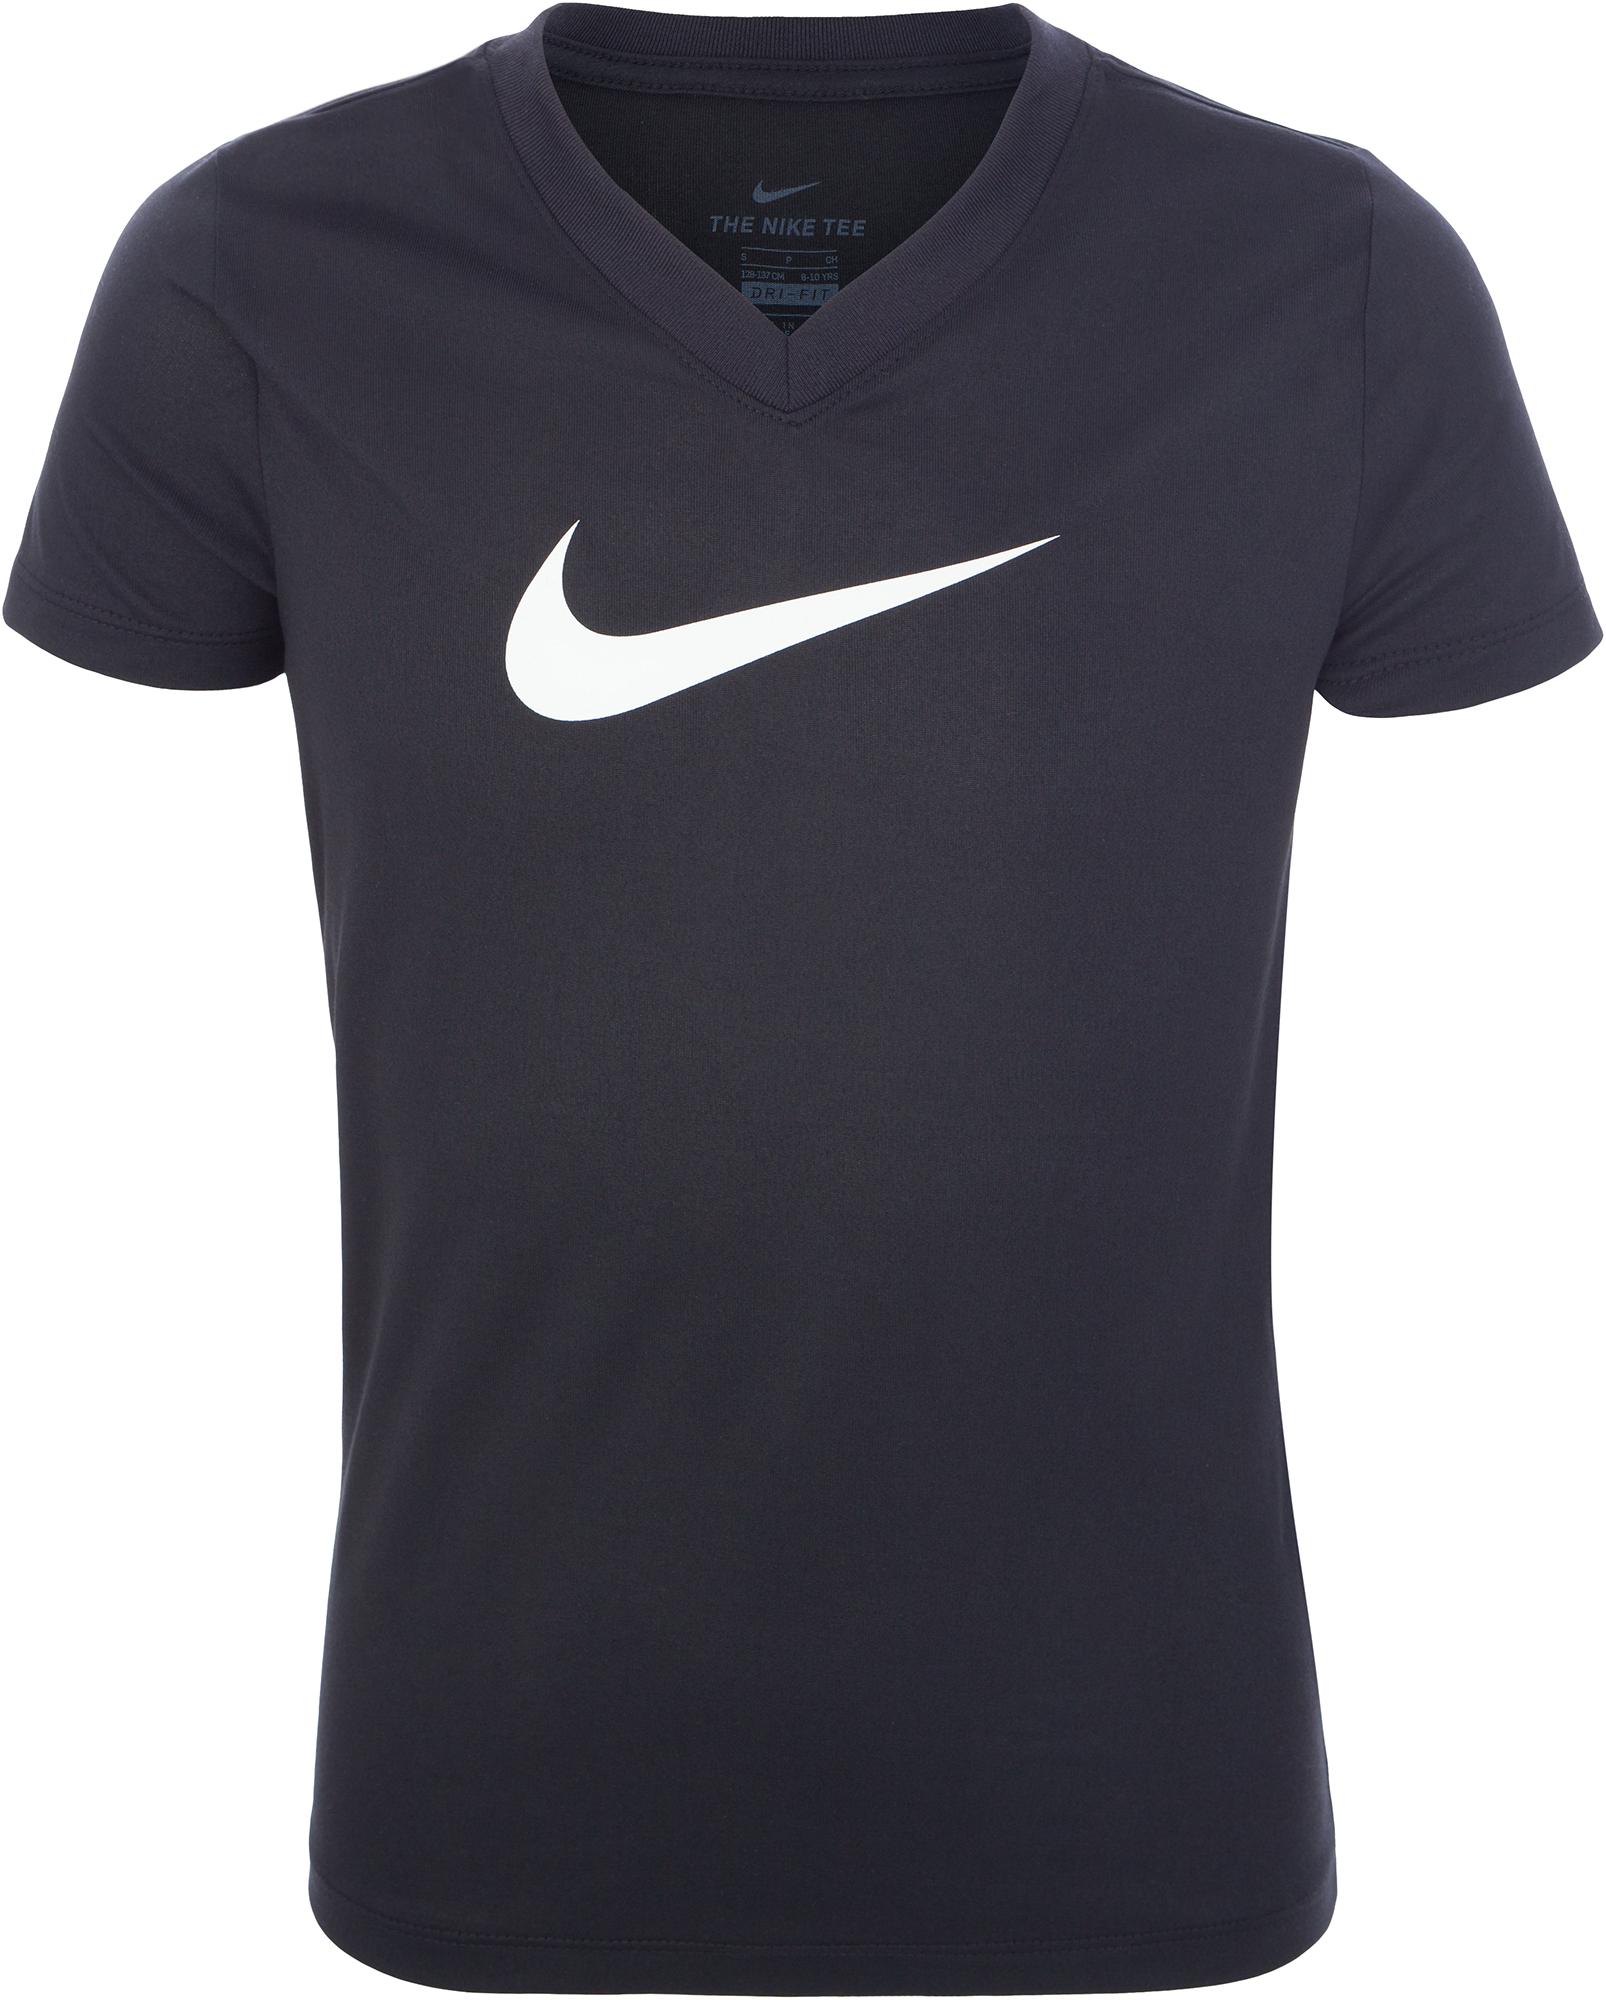 Nike Футболка для девочек Nike Dri-FIT, размер 156-164